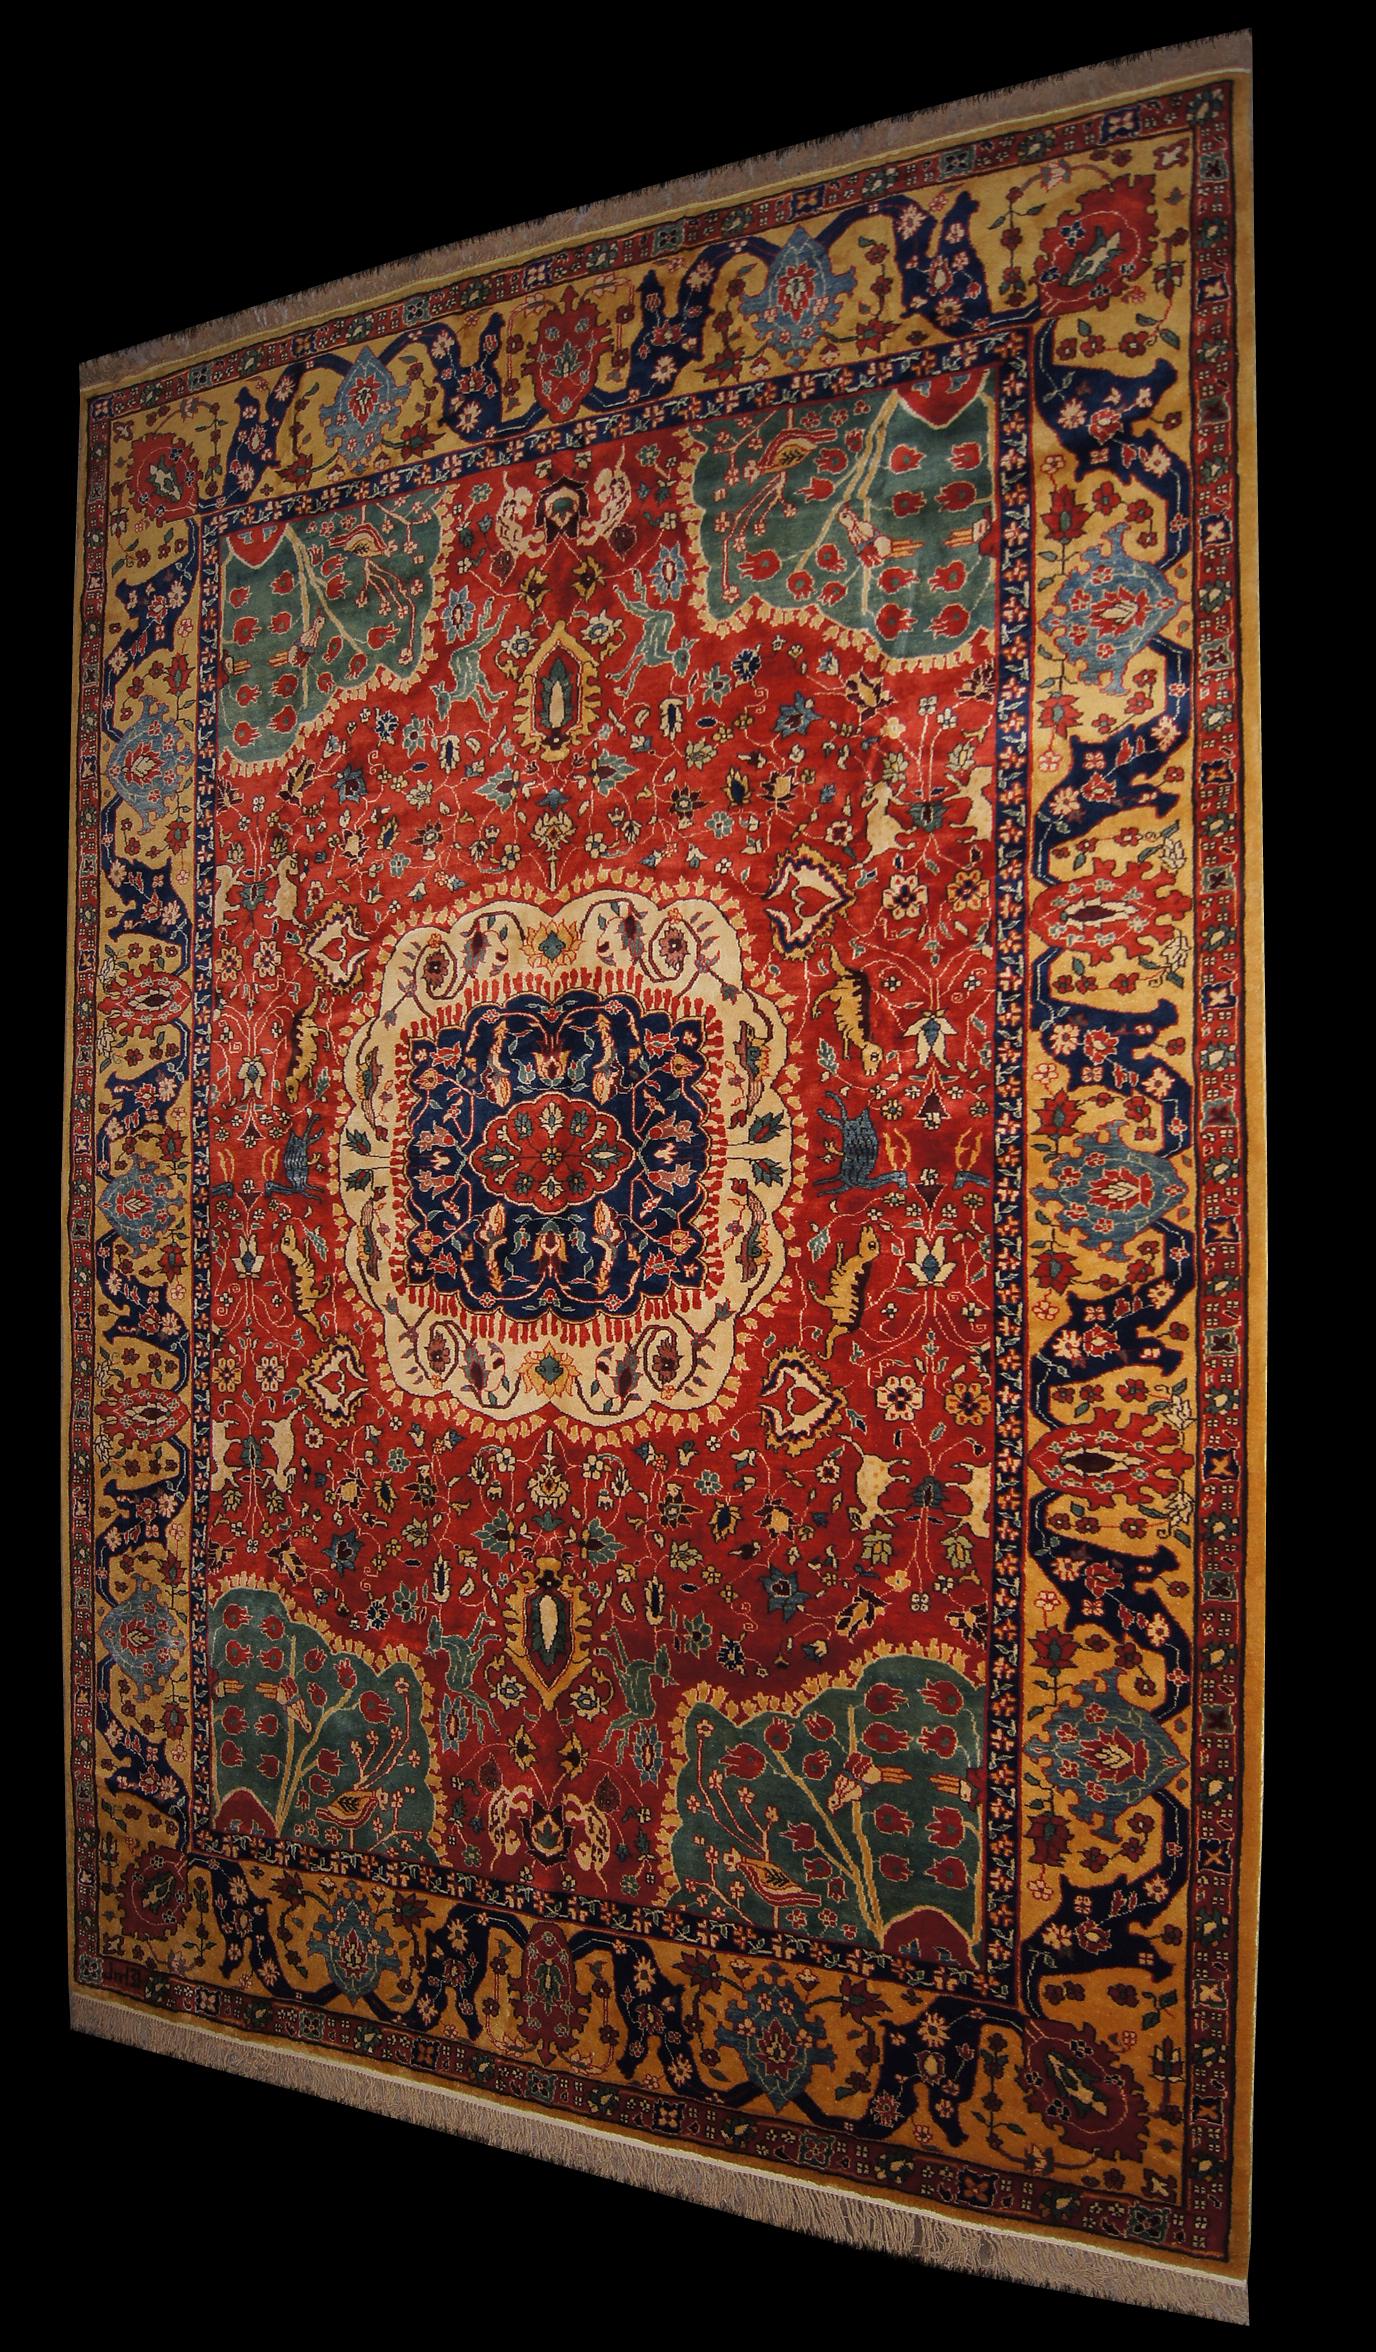 A Museum Quality Classic Safavid Rug